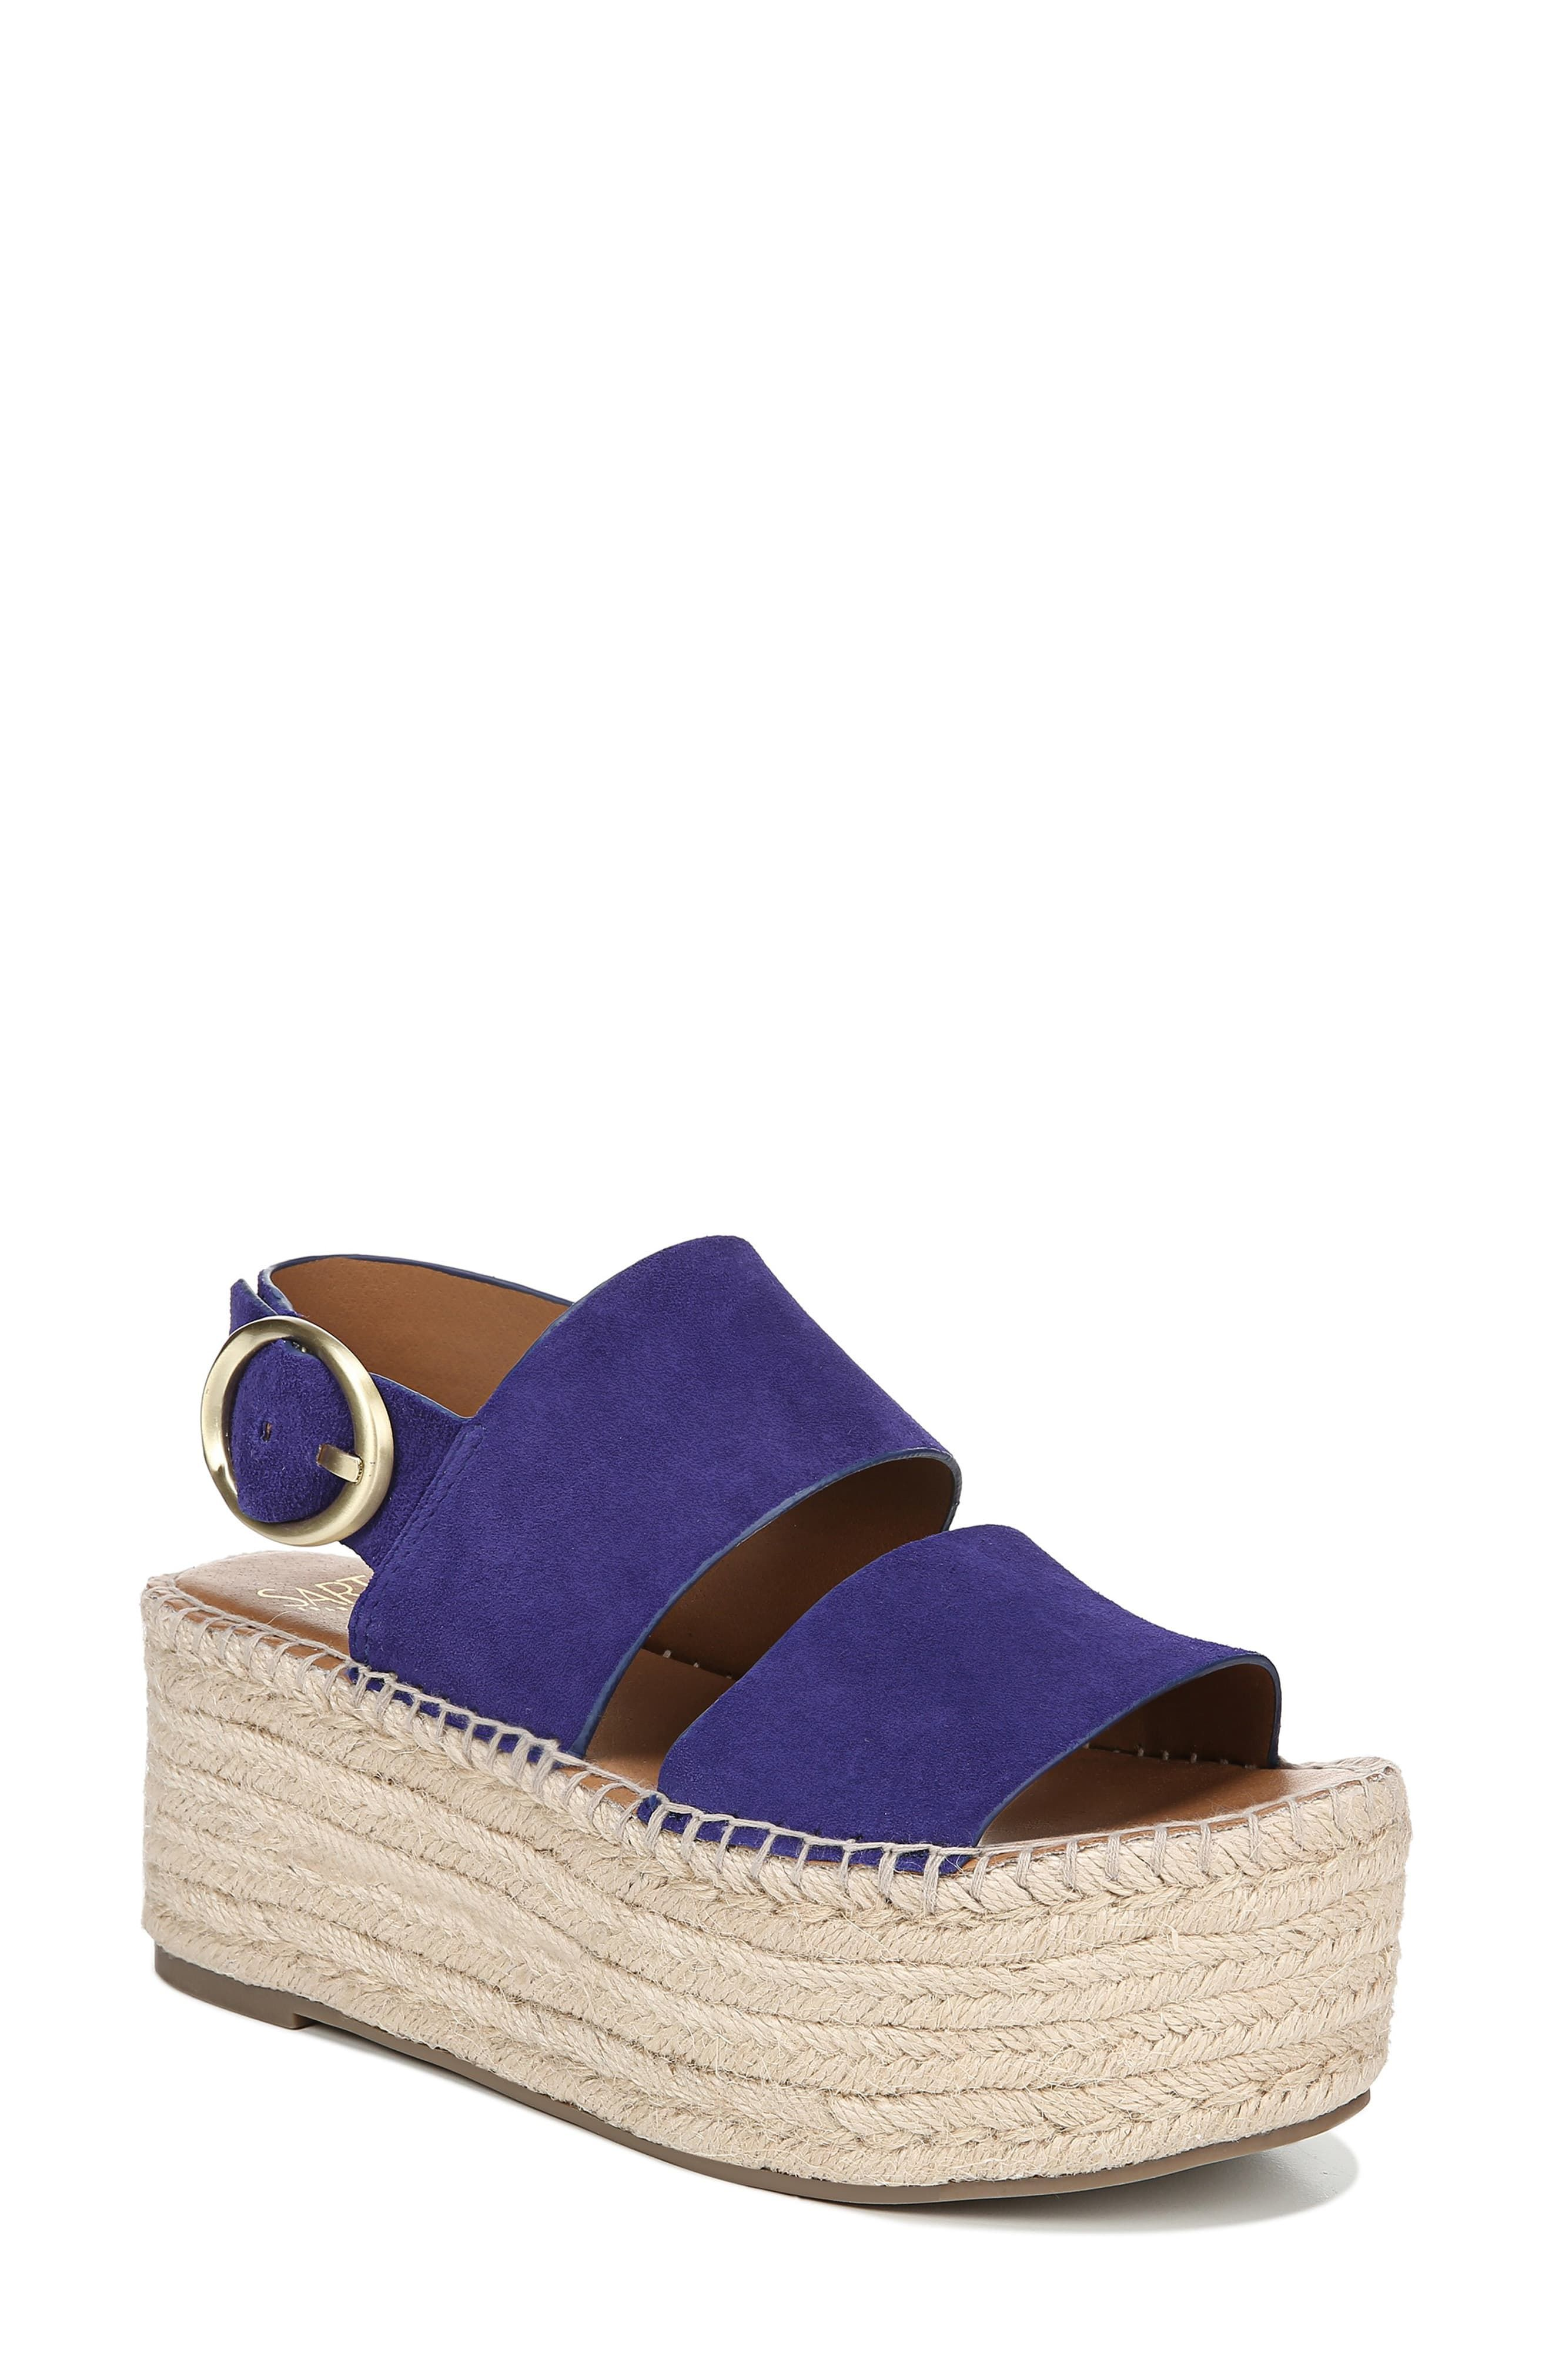 2e5cf698222 Franco Sarto Mariana Platform Sandal in 2019 | Products ...